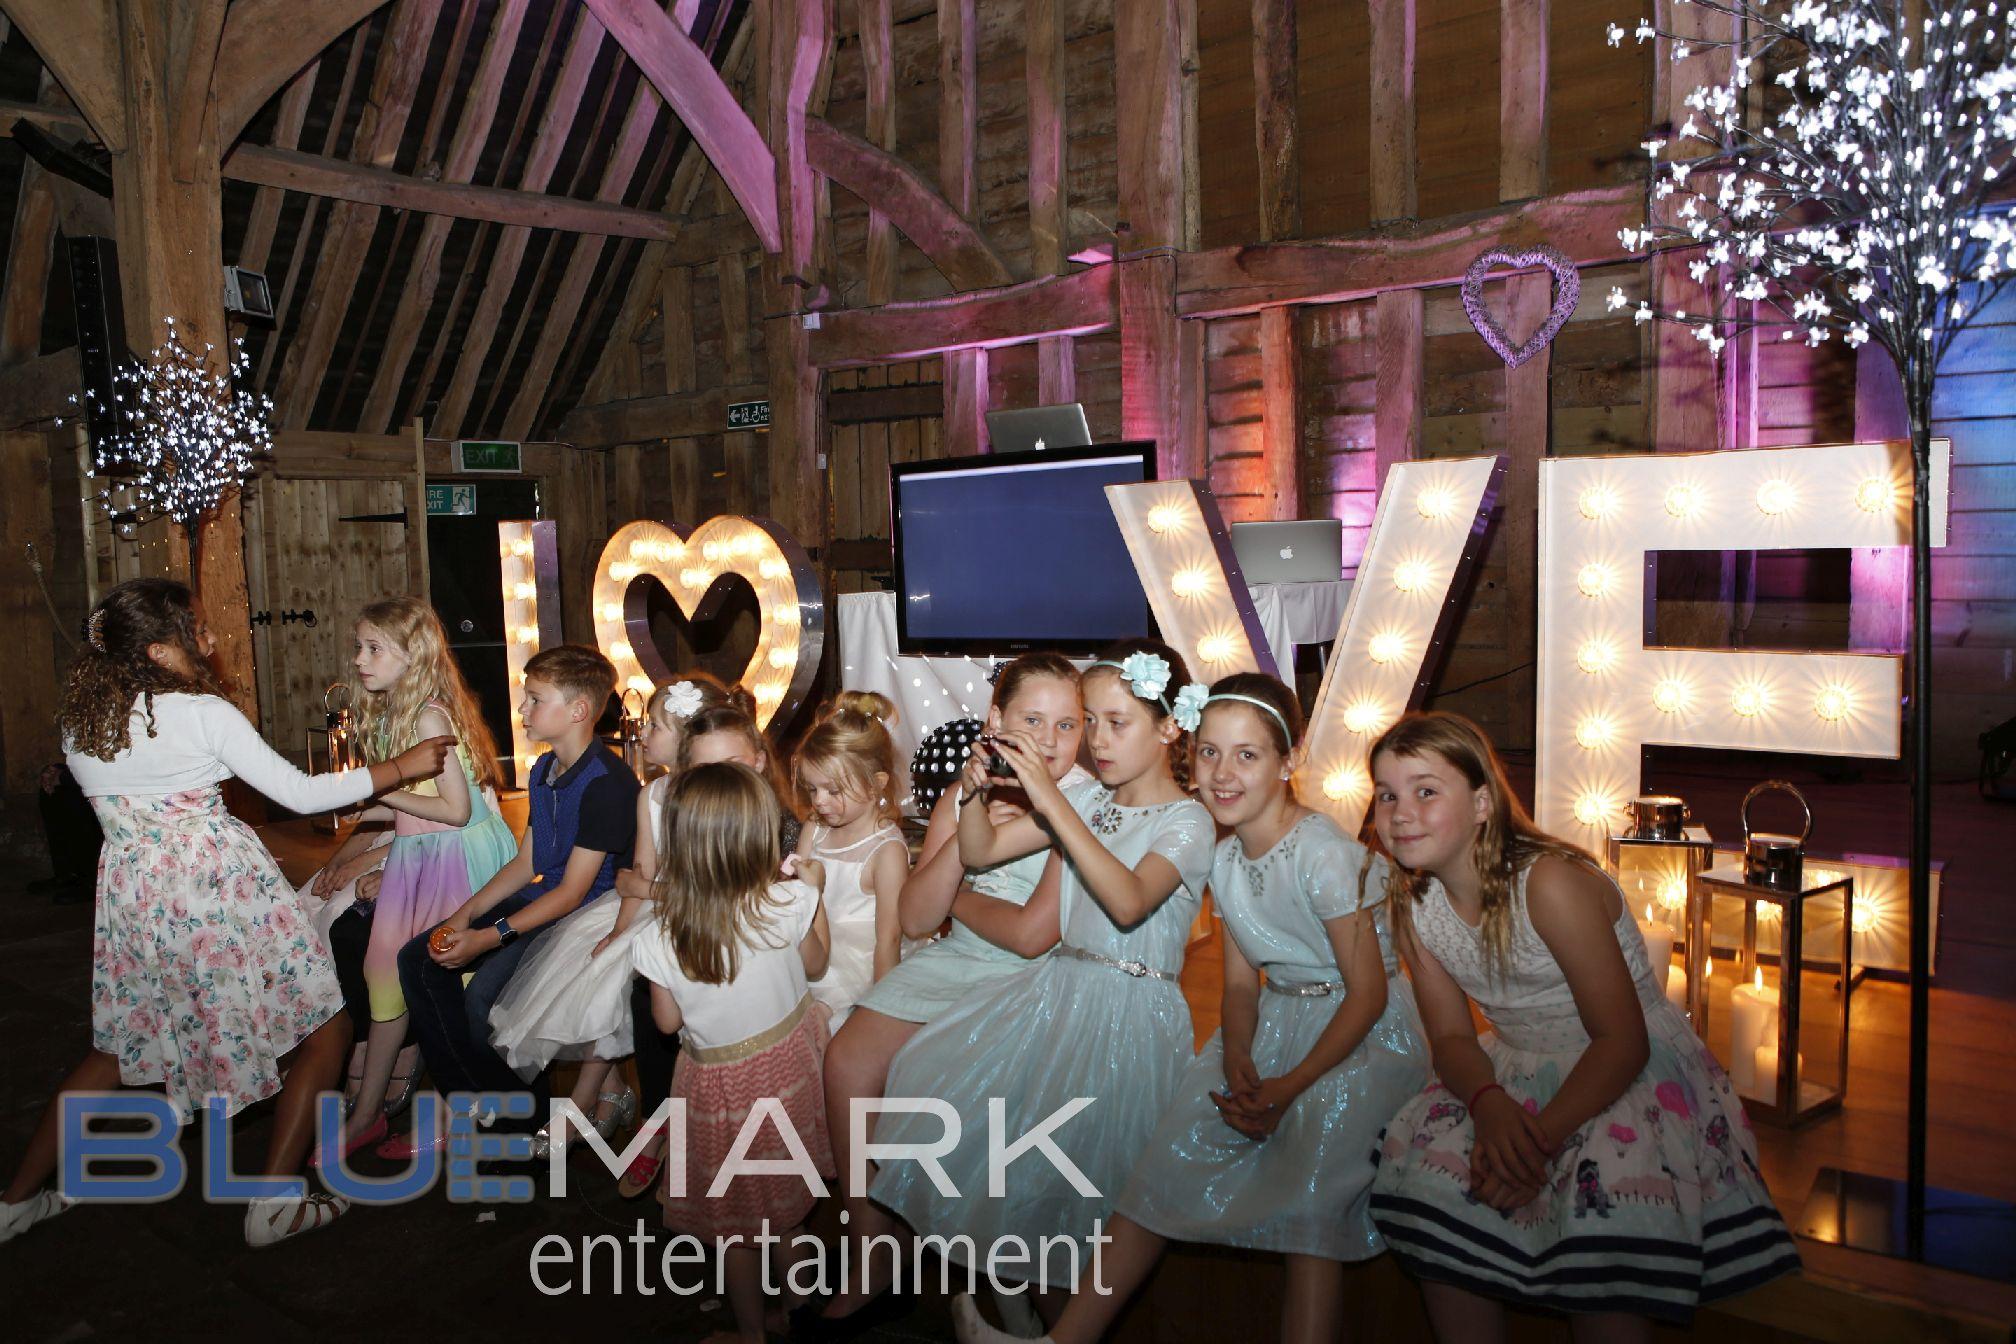 Bluemark Entertainment various images  _D3_0214.jpg